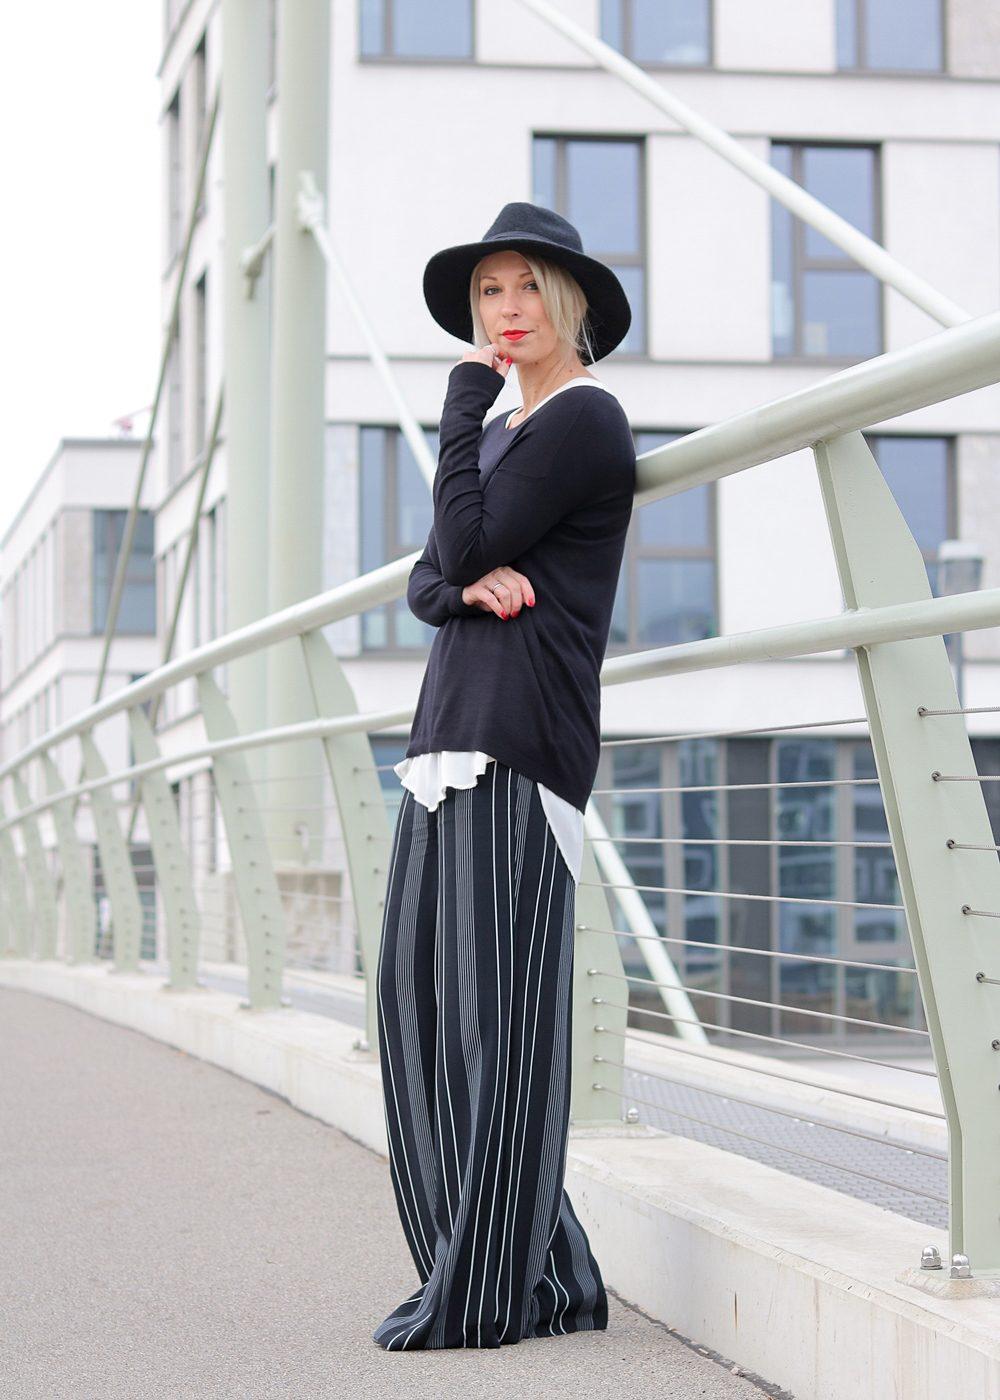 fashionblogger-outfit-palazzohose-streifen-mango-sweater-hut-2-von-17